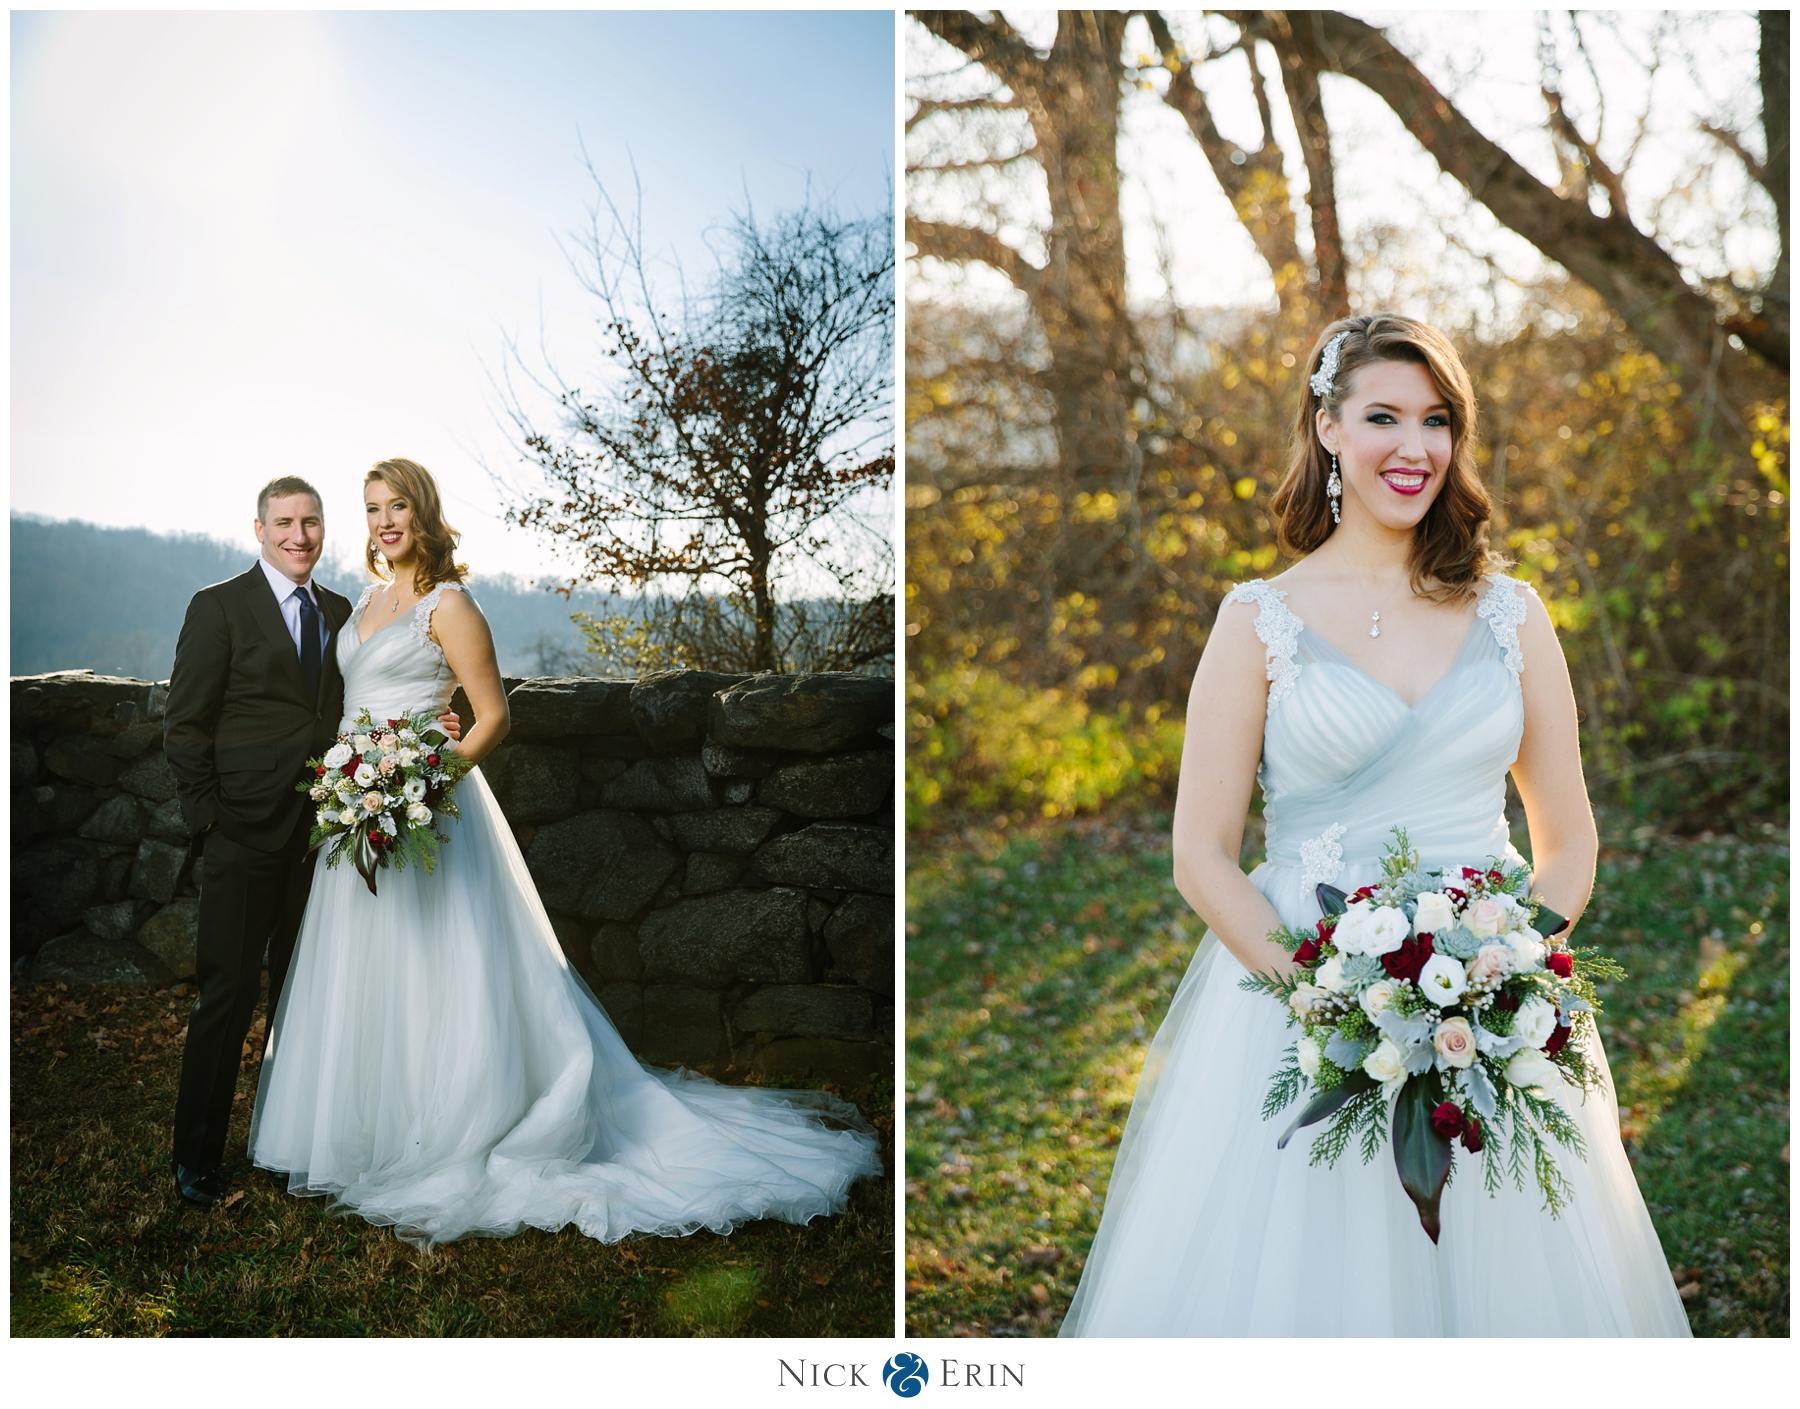 Donner_Photography_Mendenhall Inn Wedding_Blake & Kristina_0010